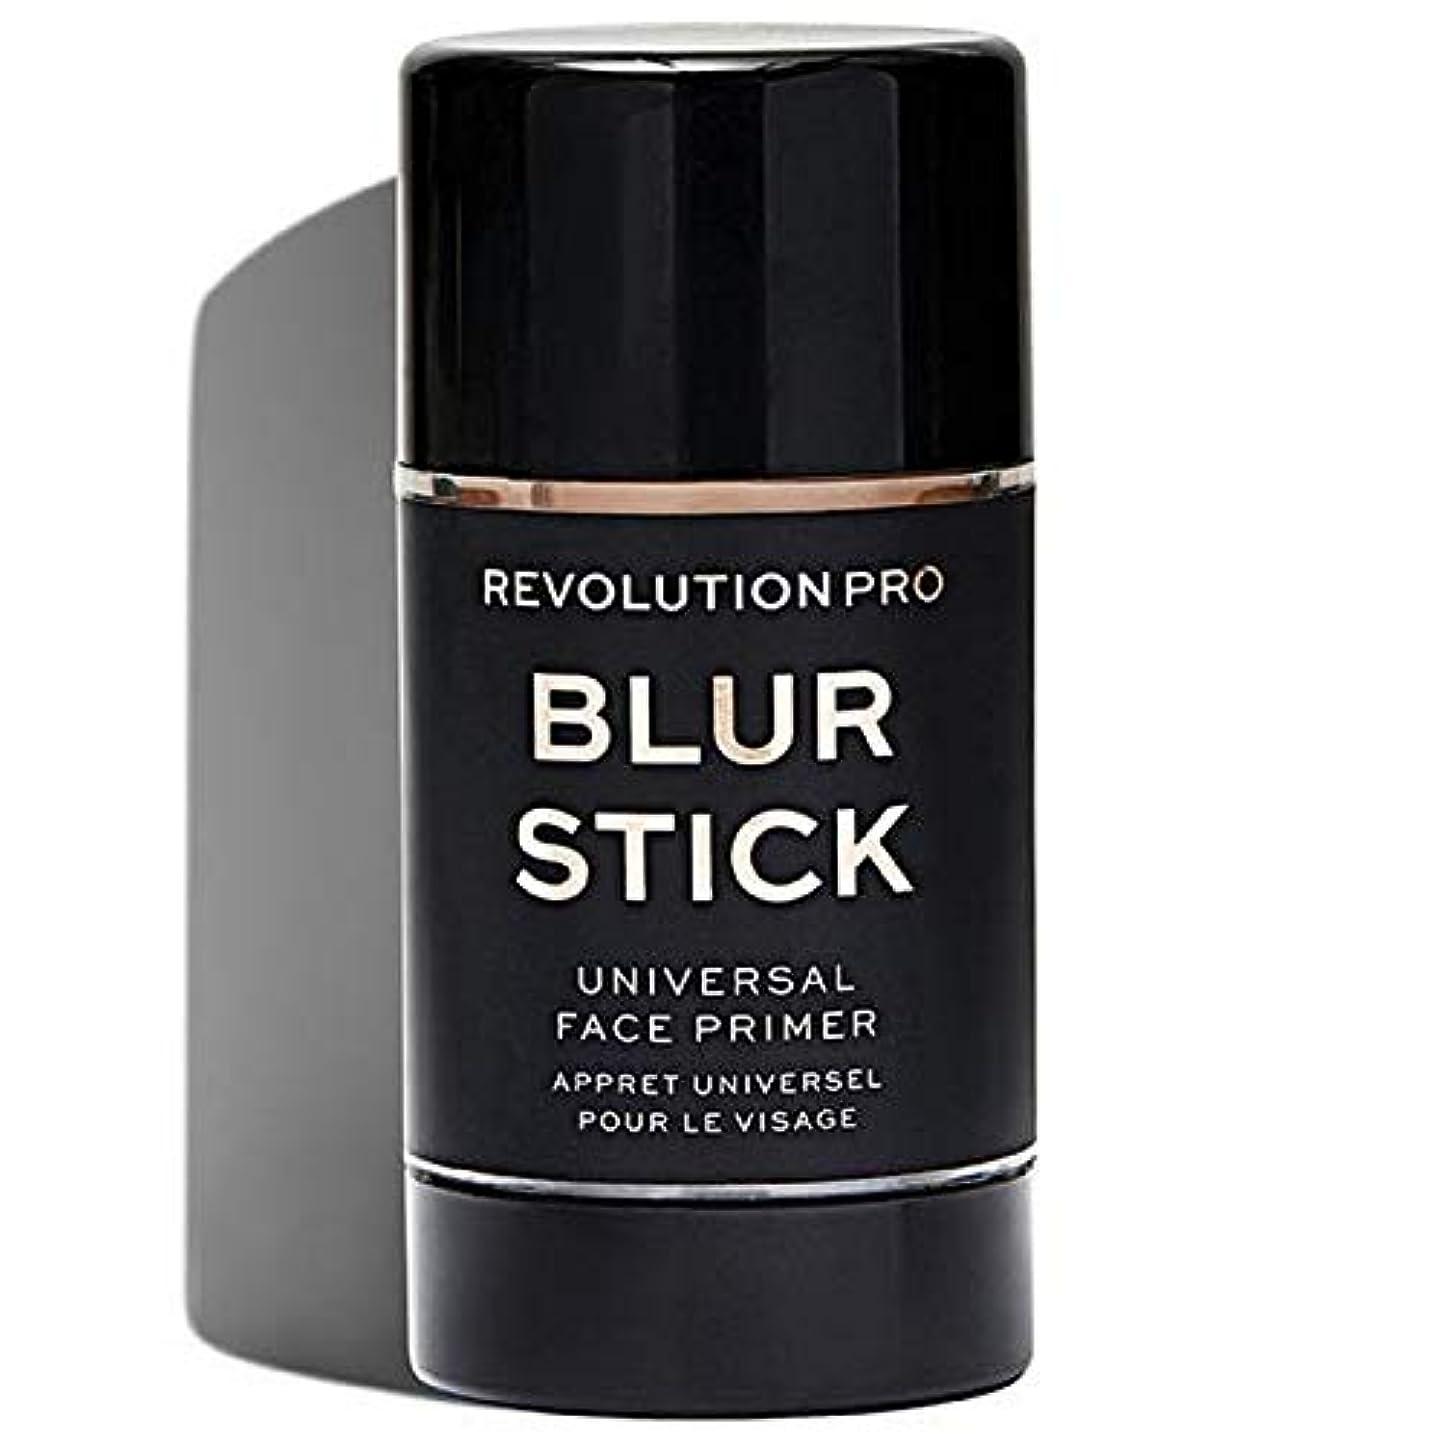 [Revolution ] 革命プロブラースティック - Revolution Pro Blur Stick [並行輸入品]